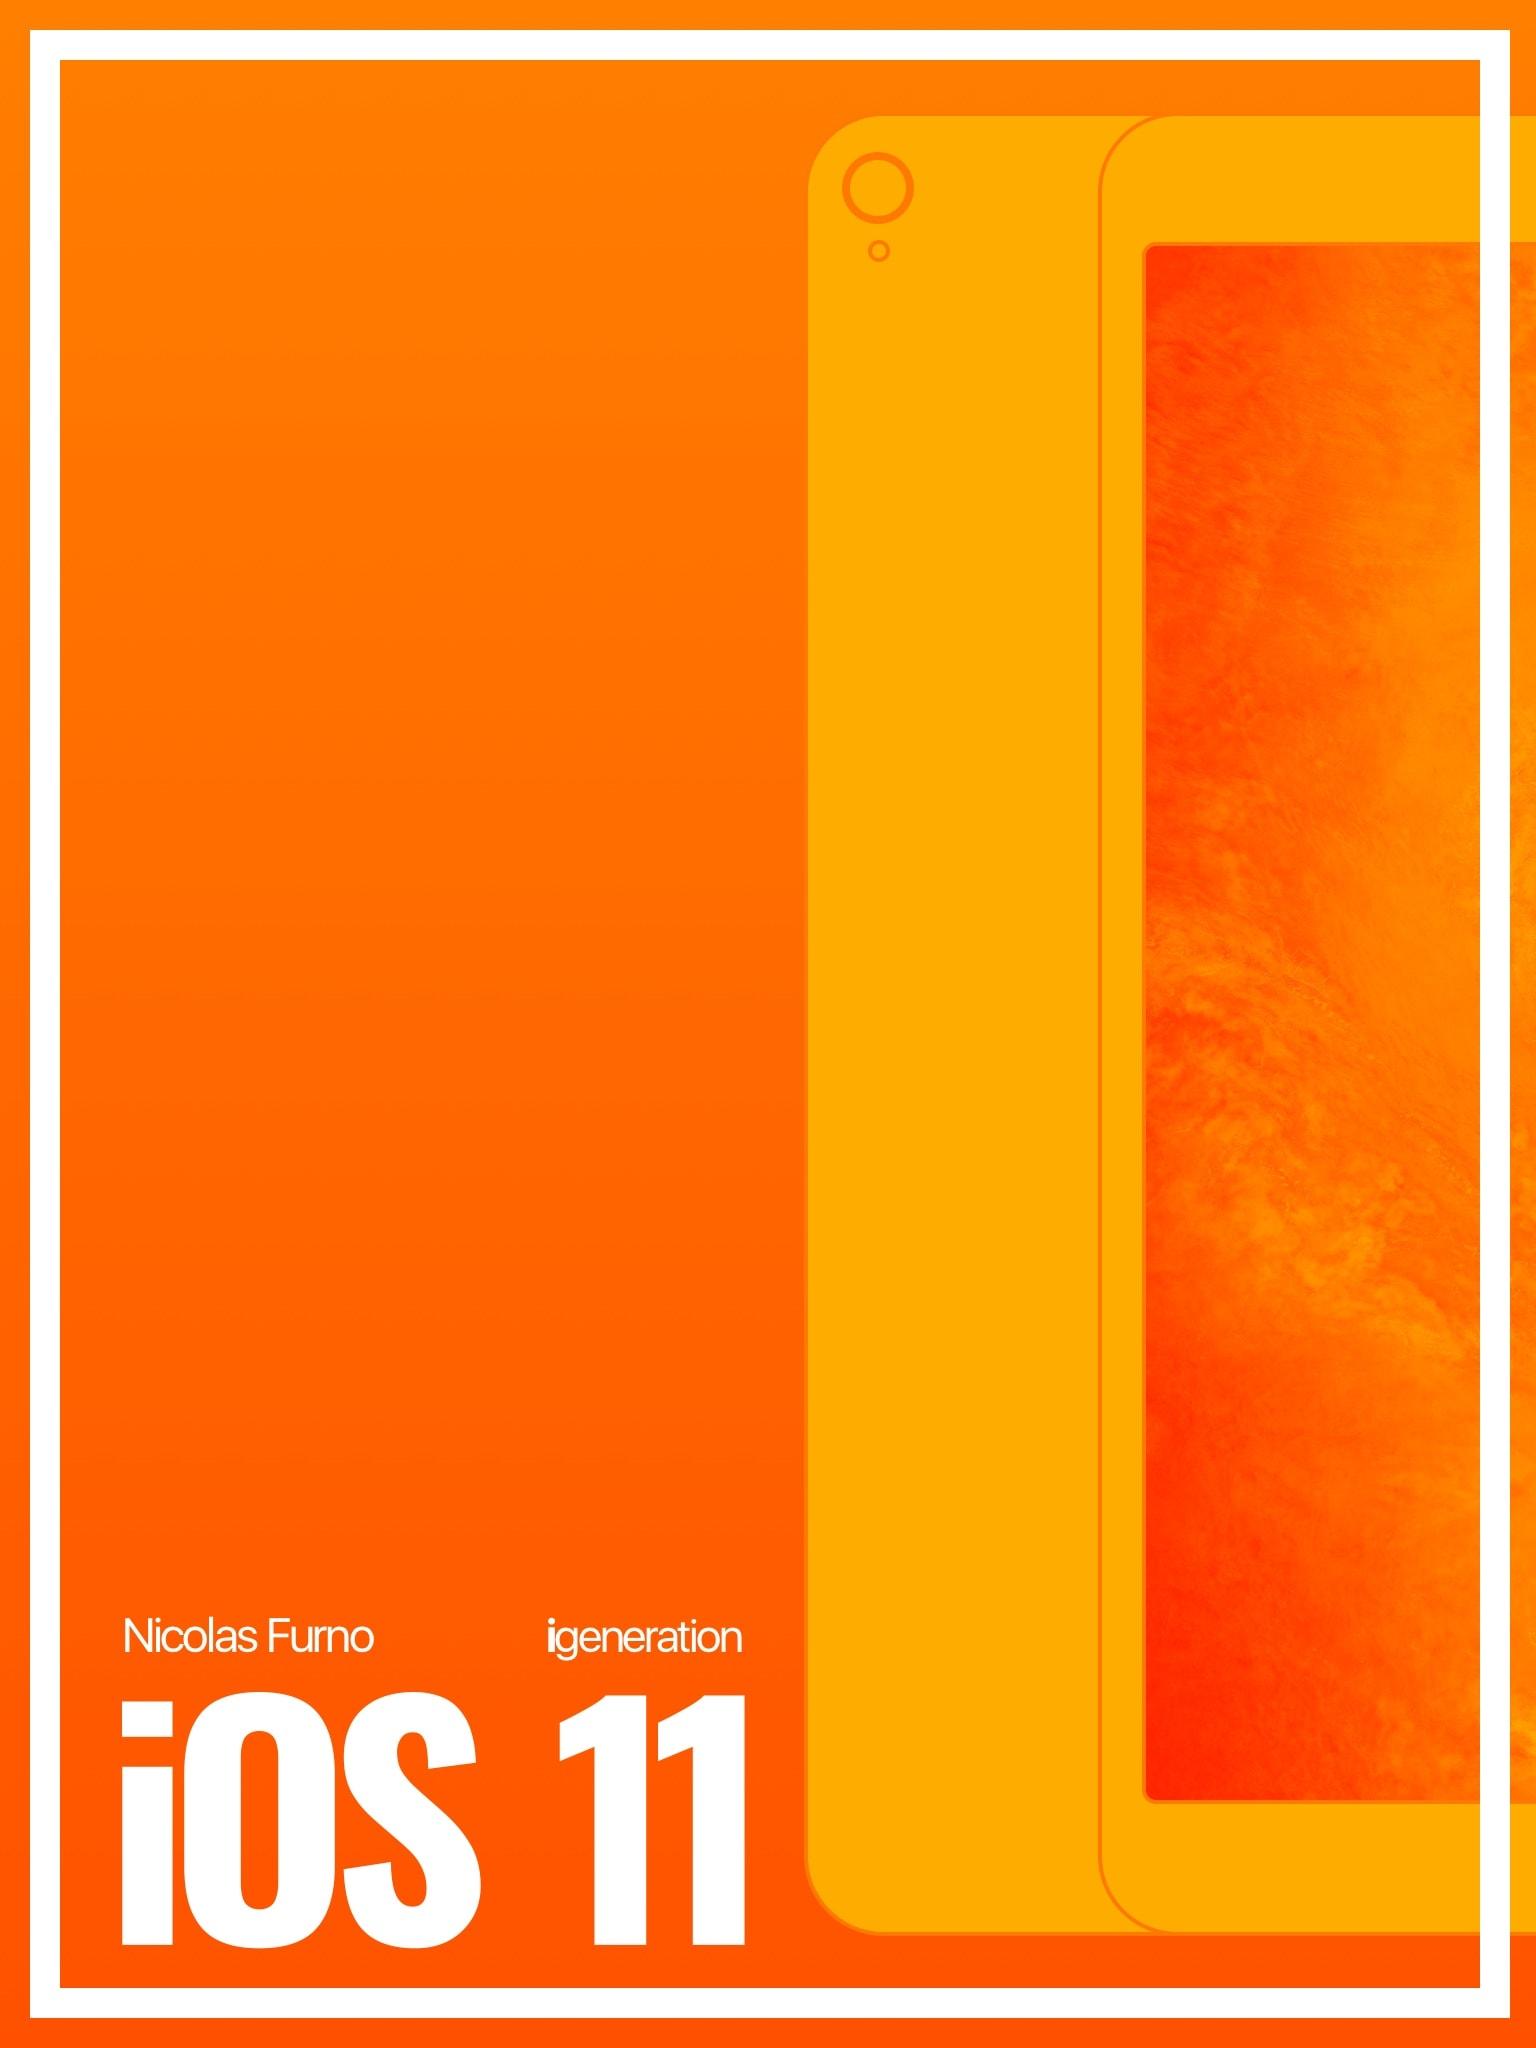 livres/ios-11.jpg